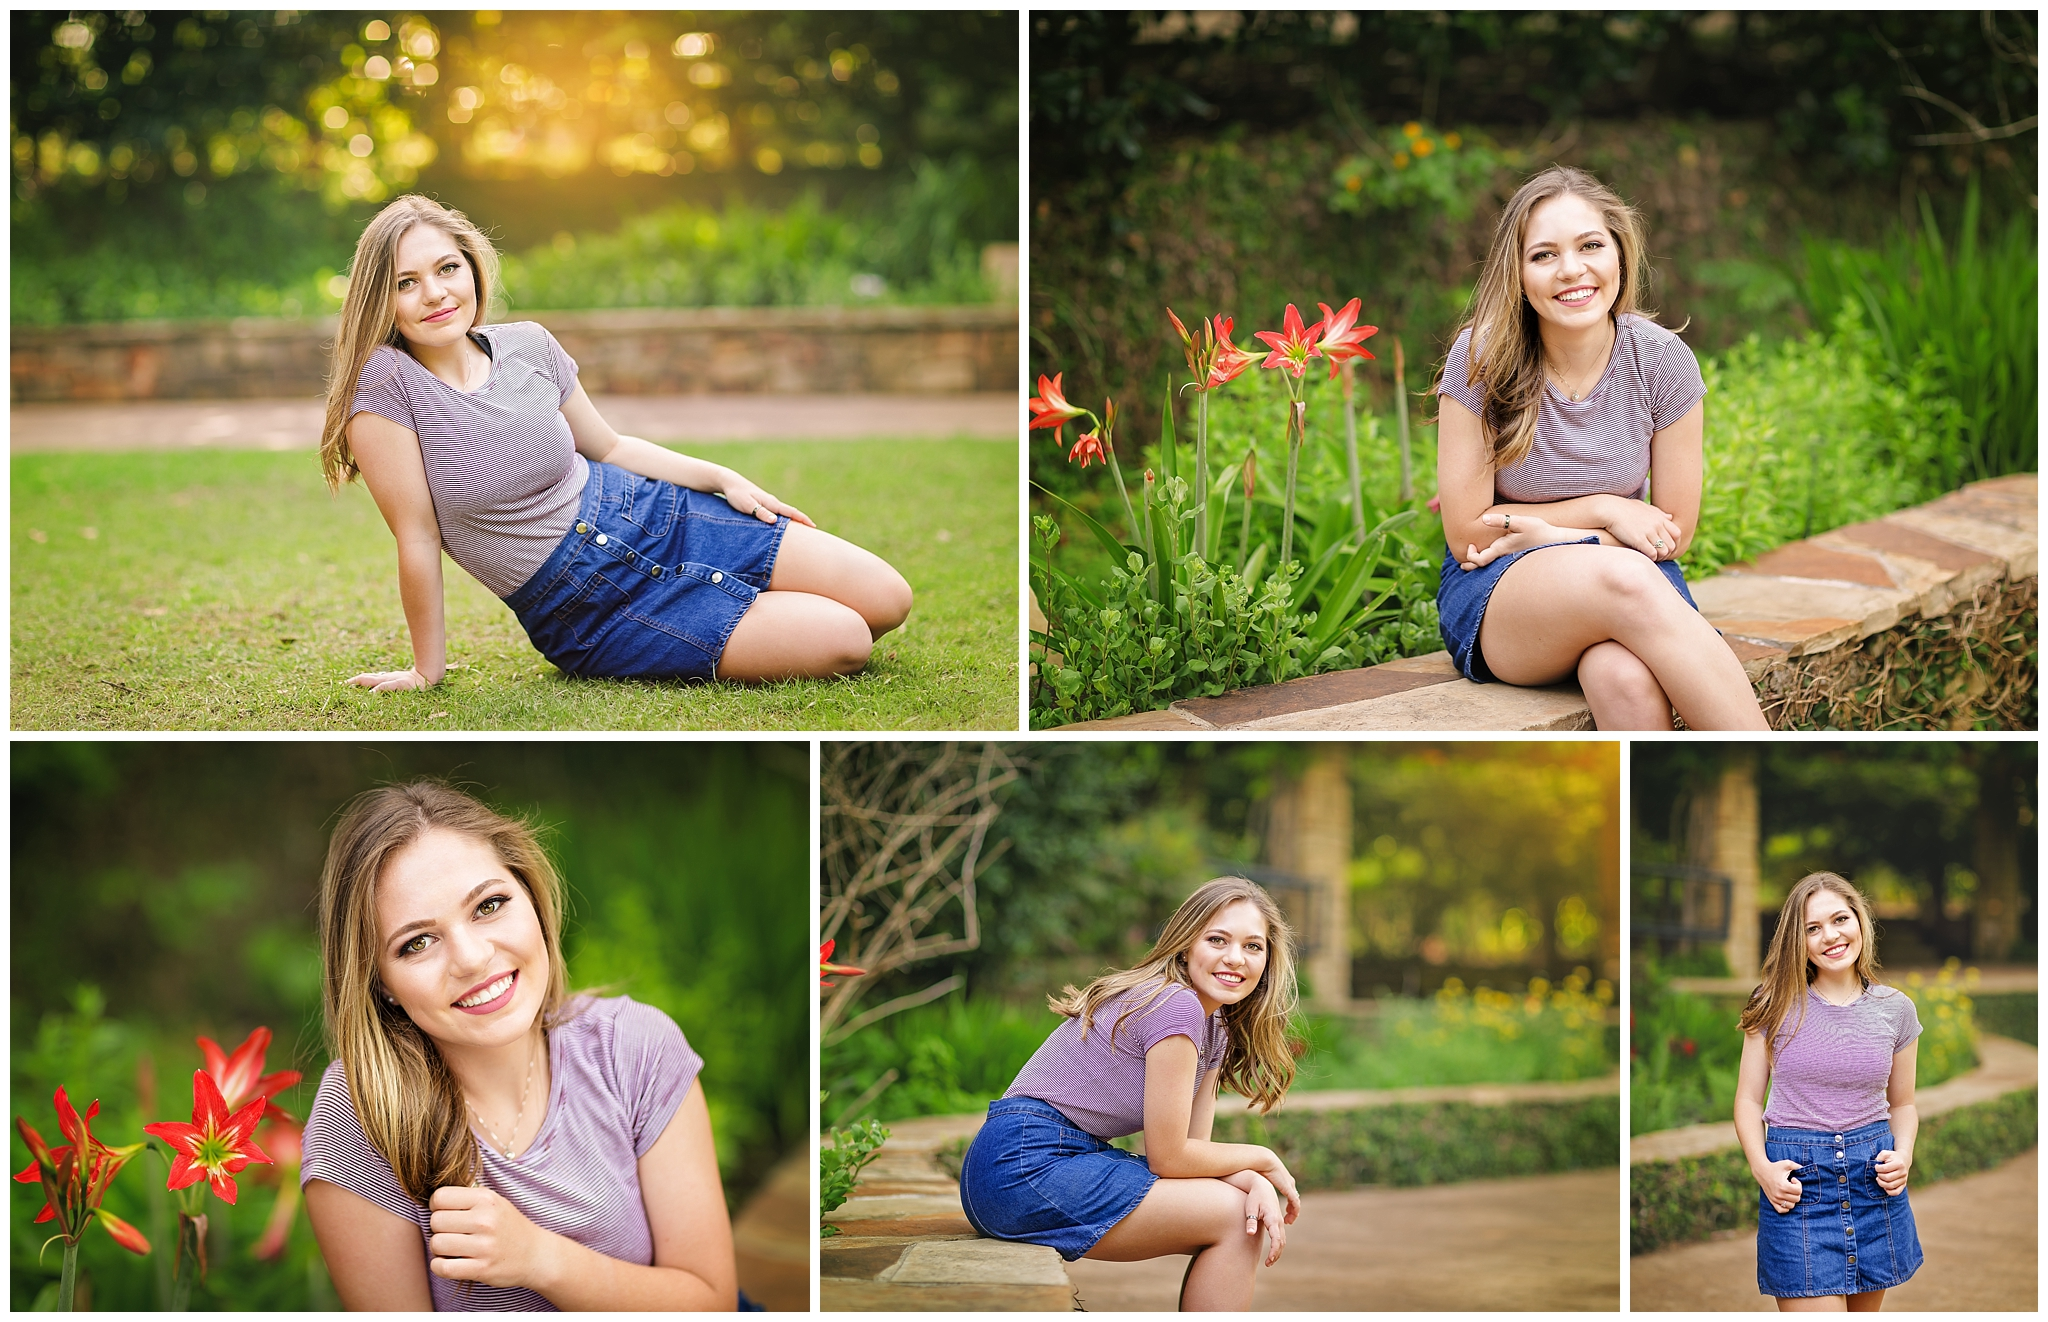 kylee-swisher-photography-senior-photographer-high-school-dfw-fort-worth-tx-texas-north-denton-haslet-roanoke-trophy-club-flower-mound-keller-southlake-grapevine